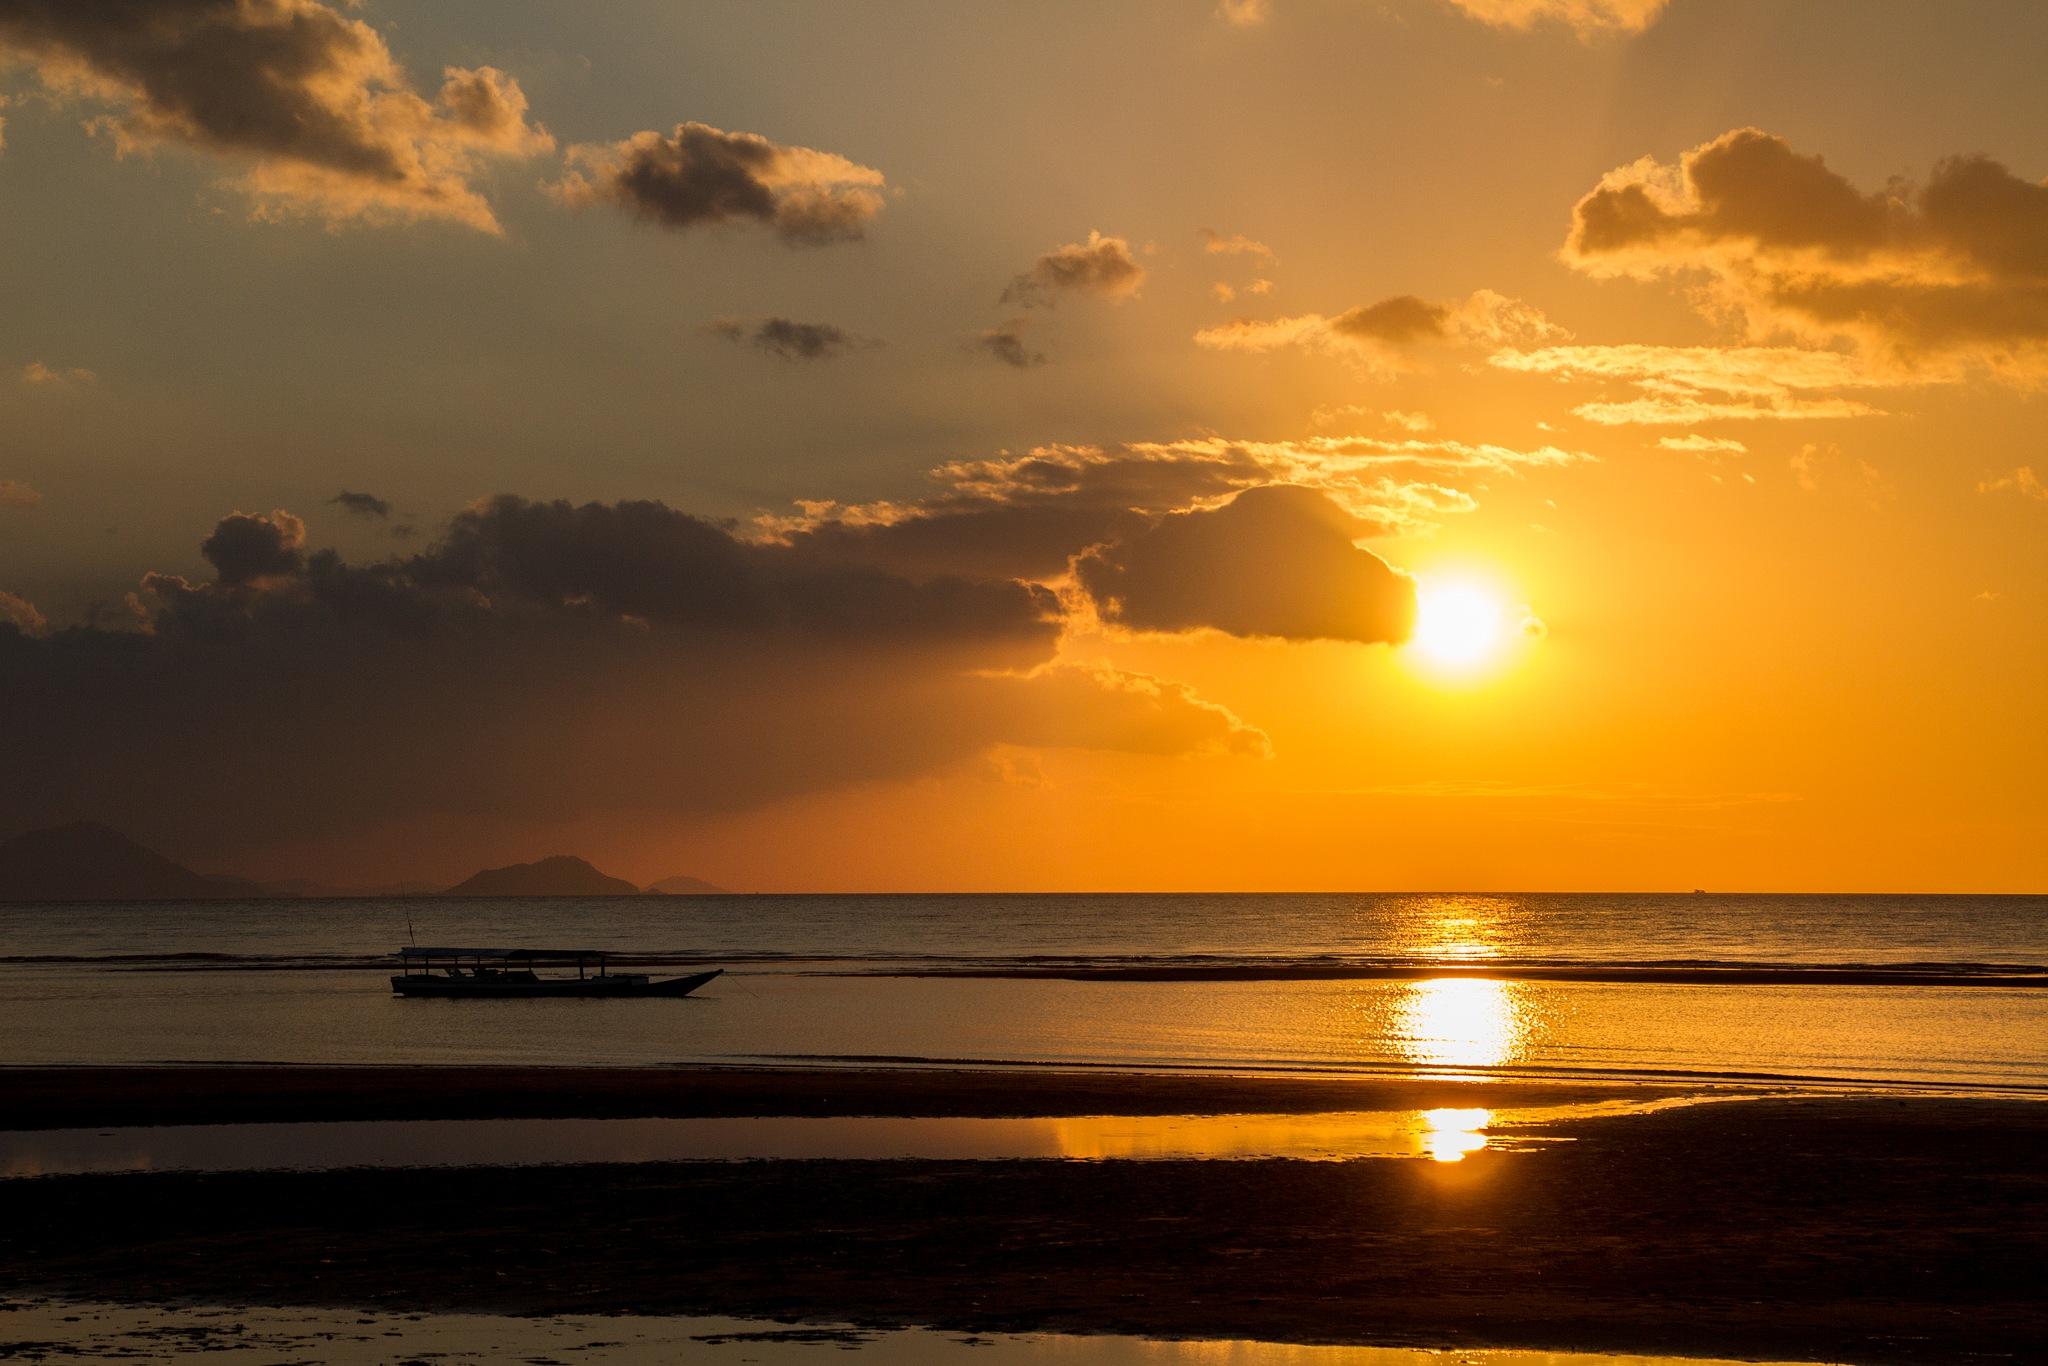 Sunset in Indonesia by piero marino